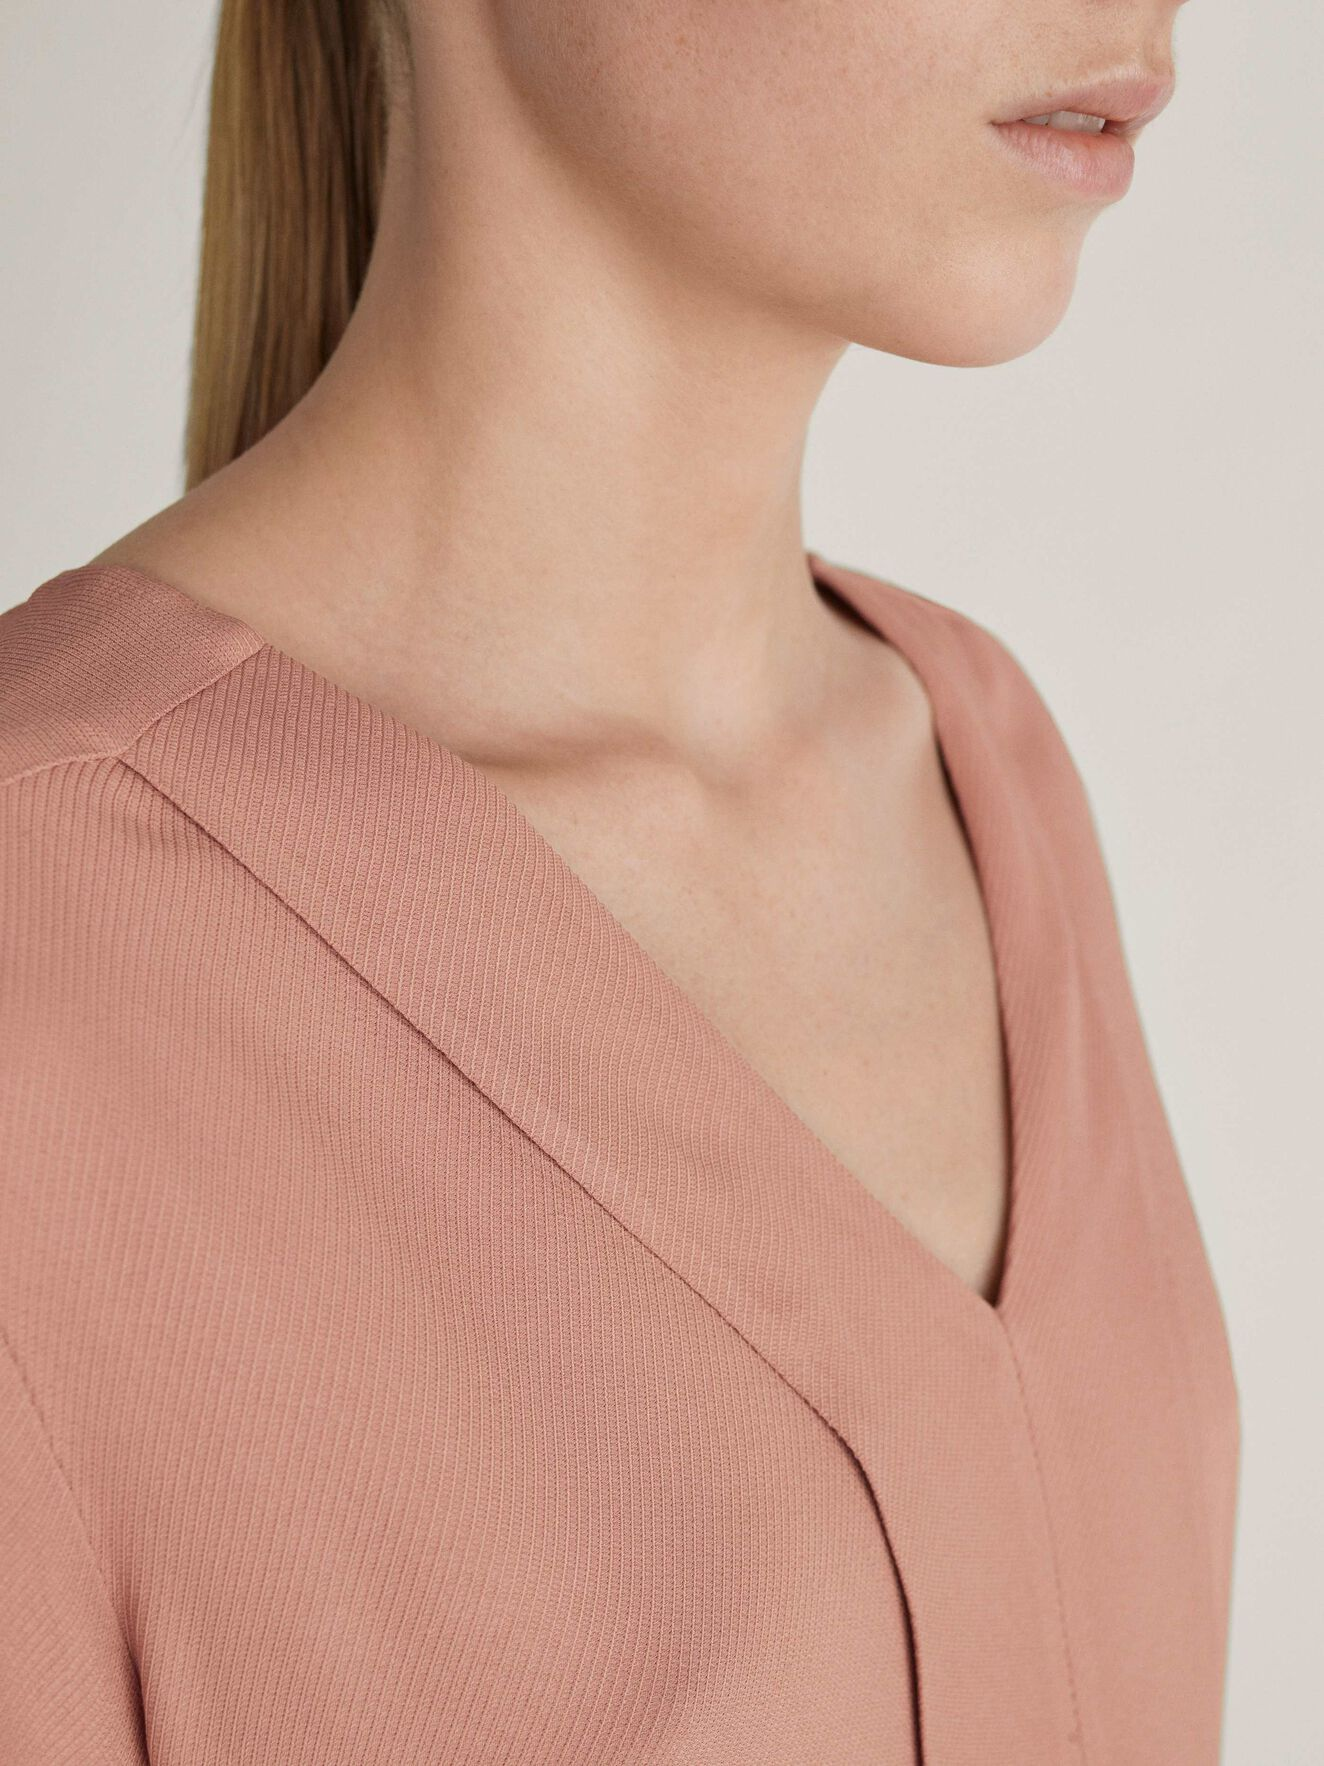 Meristem Top in Soft Blush from Tiger of Sweden